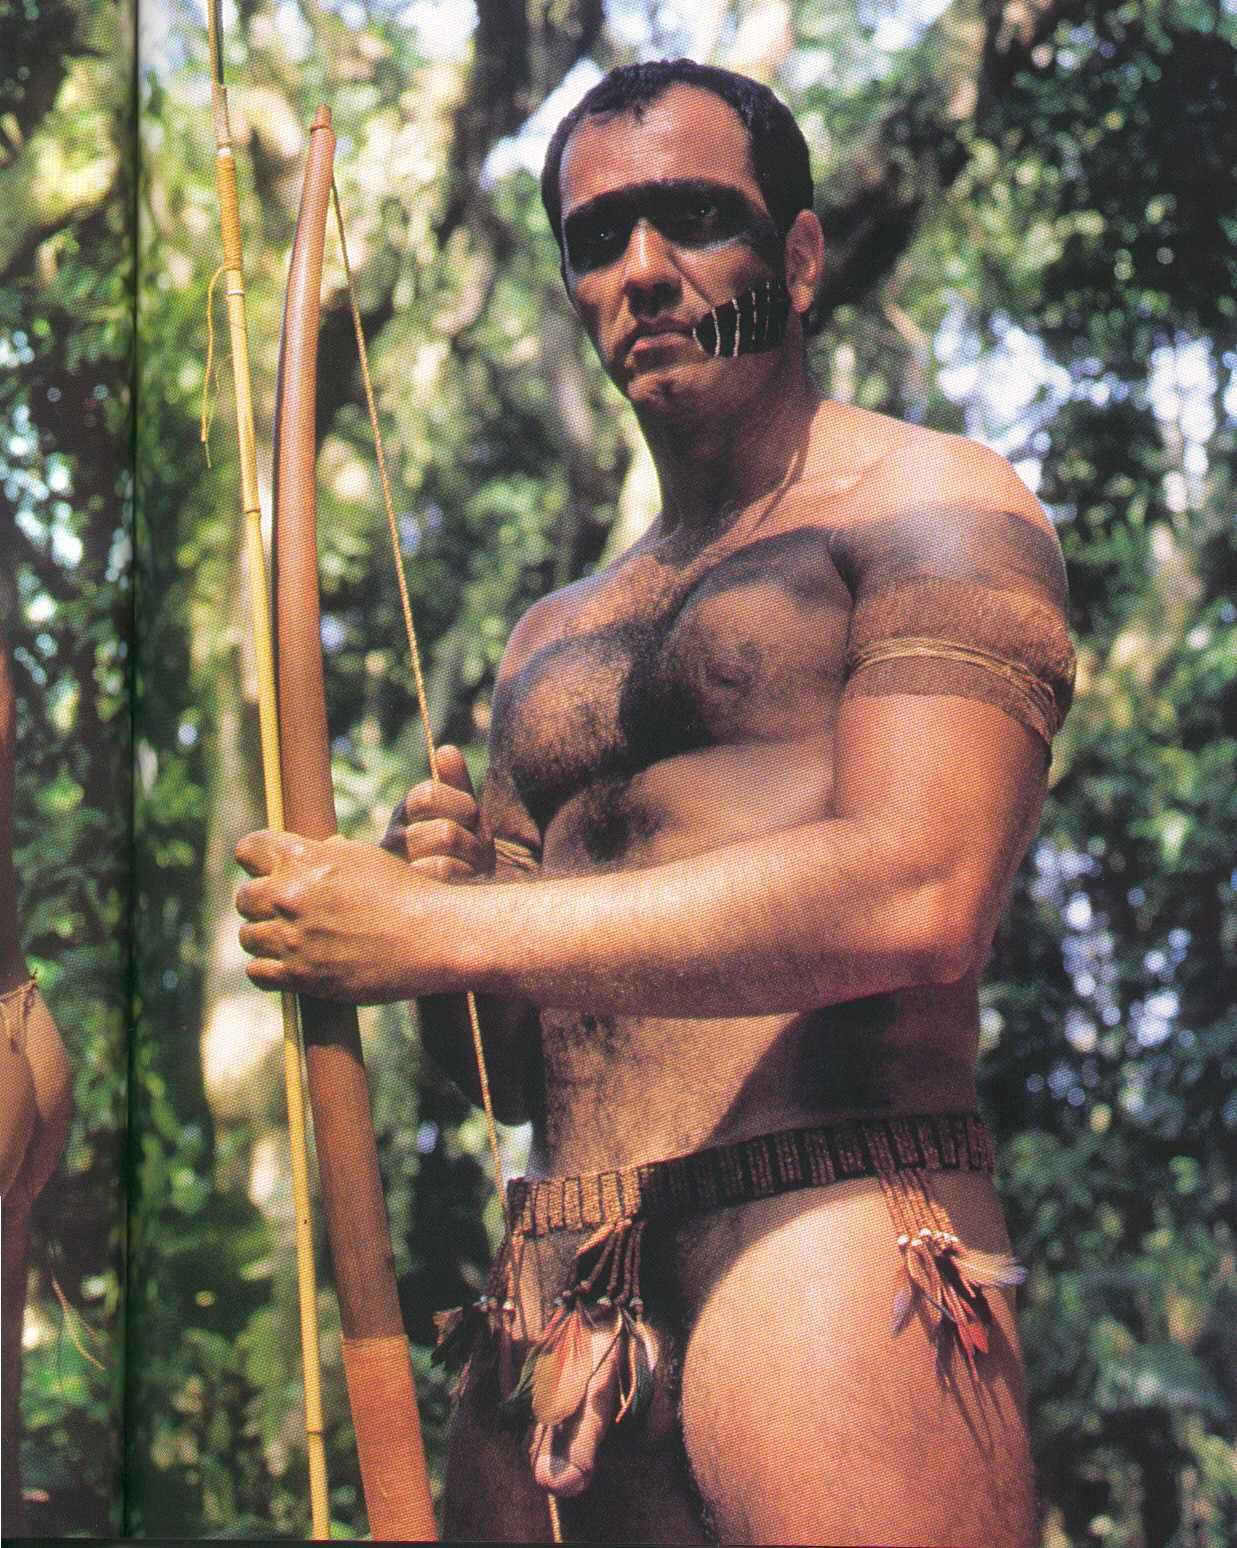 Famosos Hairy Peludos Pentelhudos Humberto Martins Naked Pelado